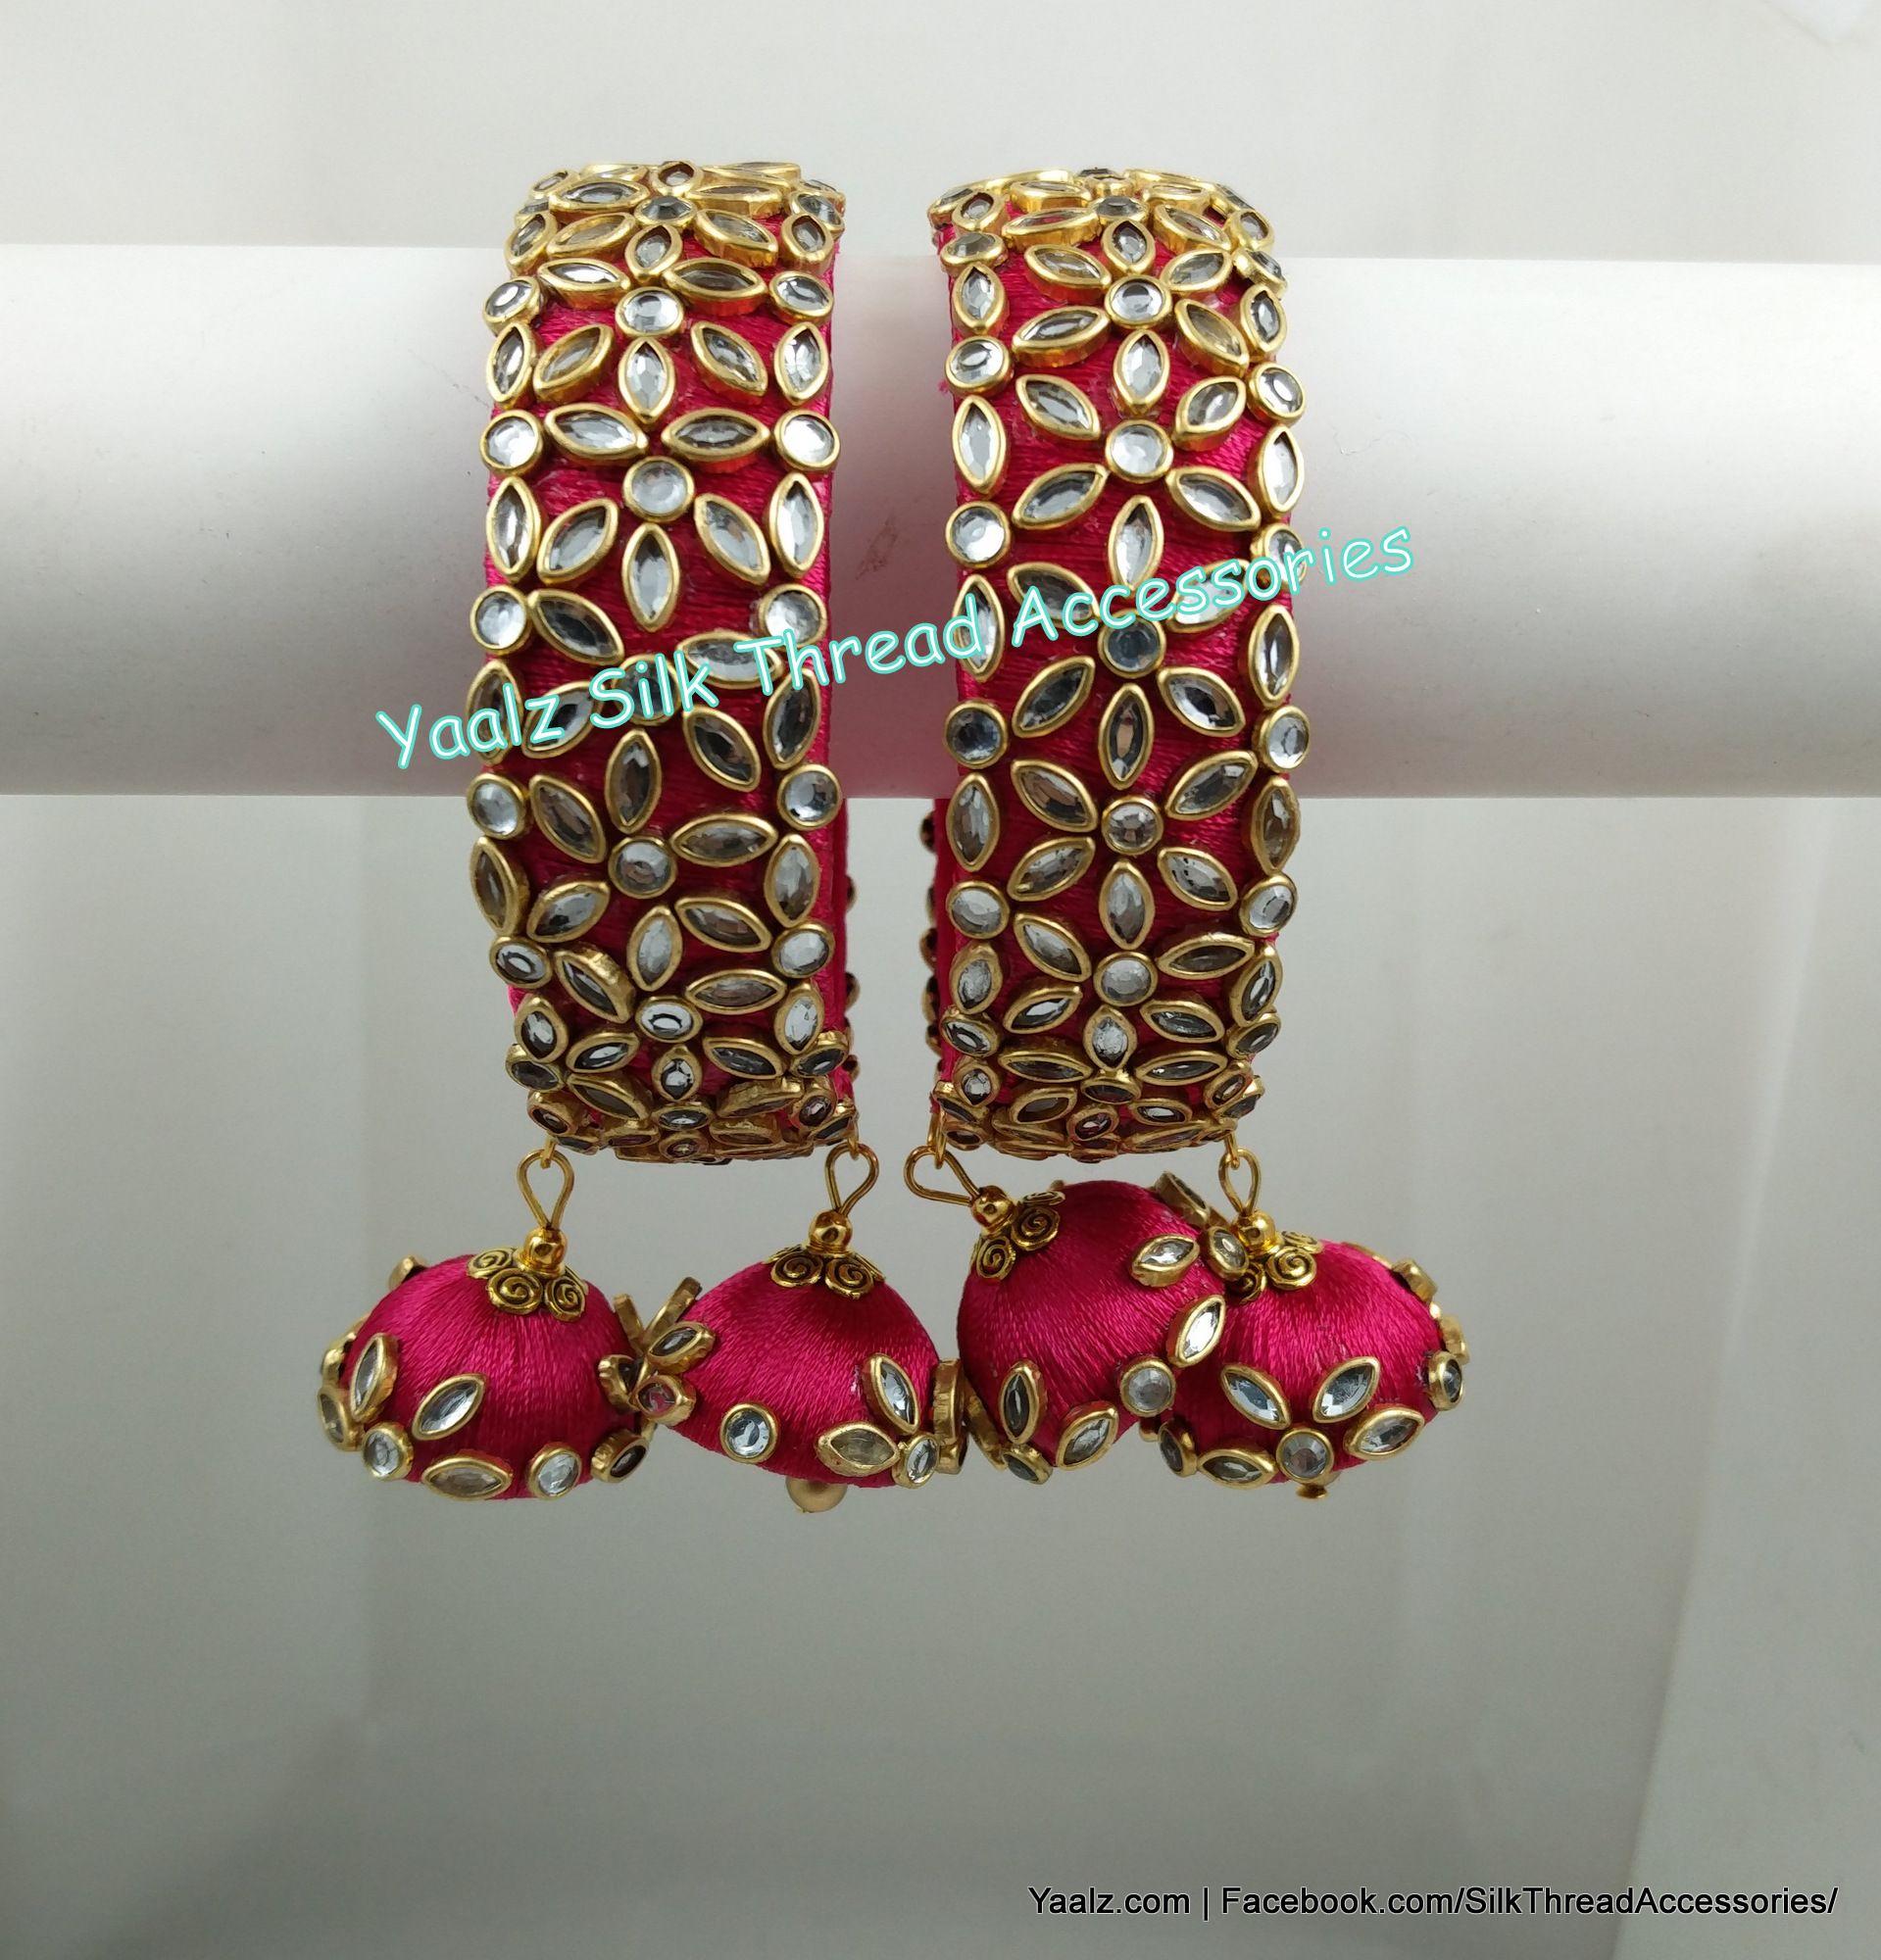 de7834eb2aa29 Yaalz Heavy Kundan Stone Work Bangle Set In Pinkish Red Color ...